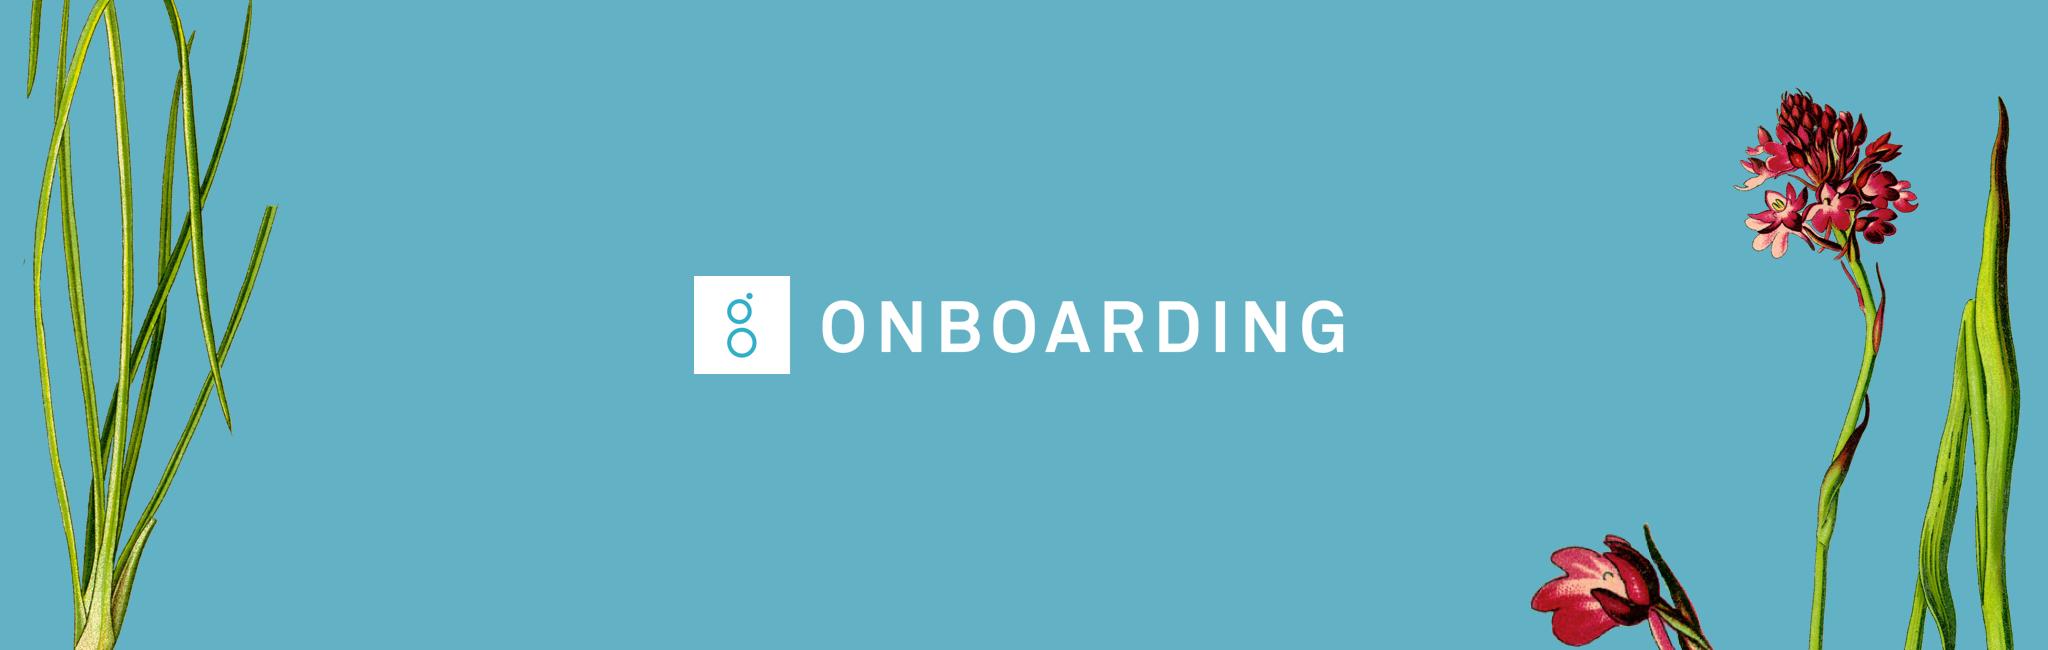 Onboarding Blog